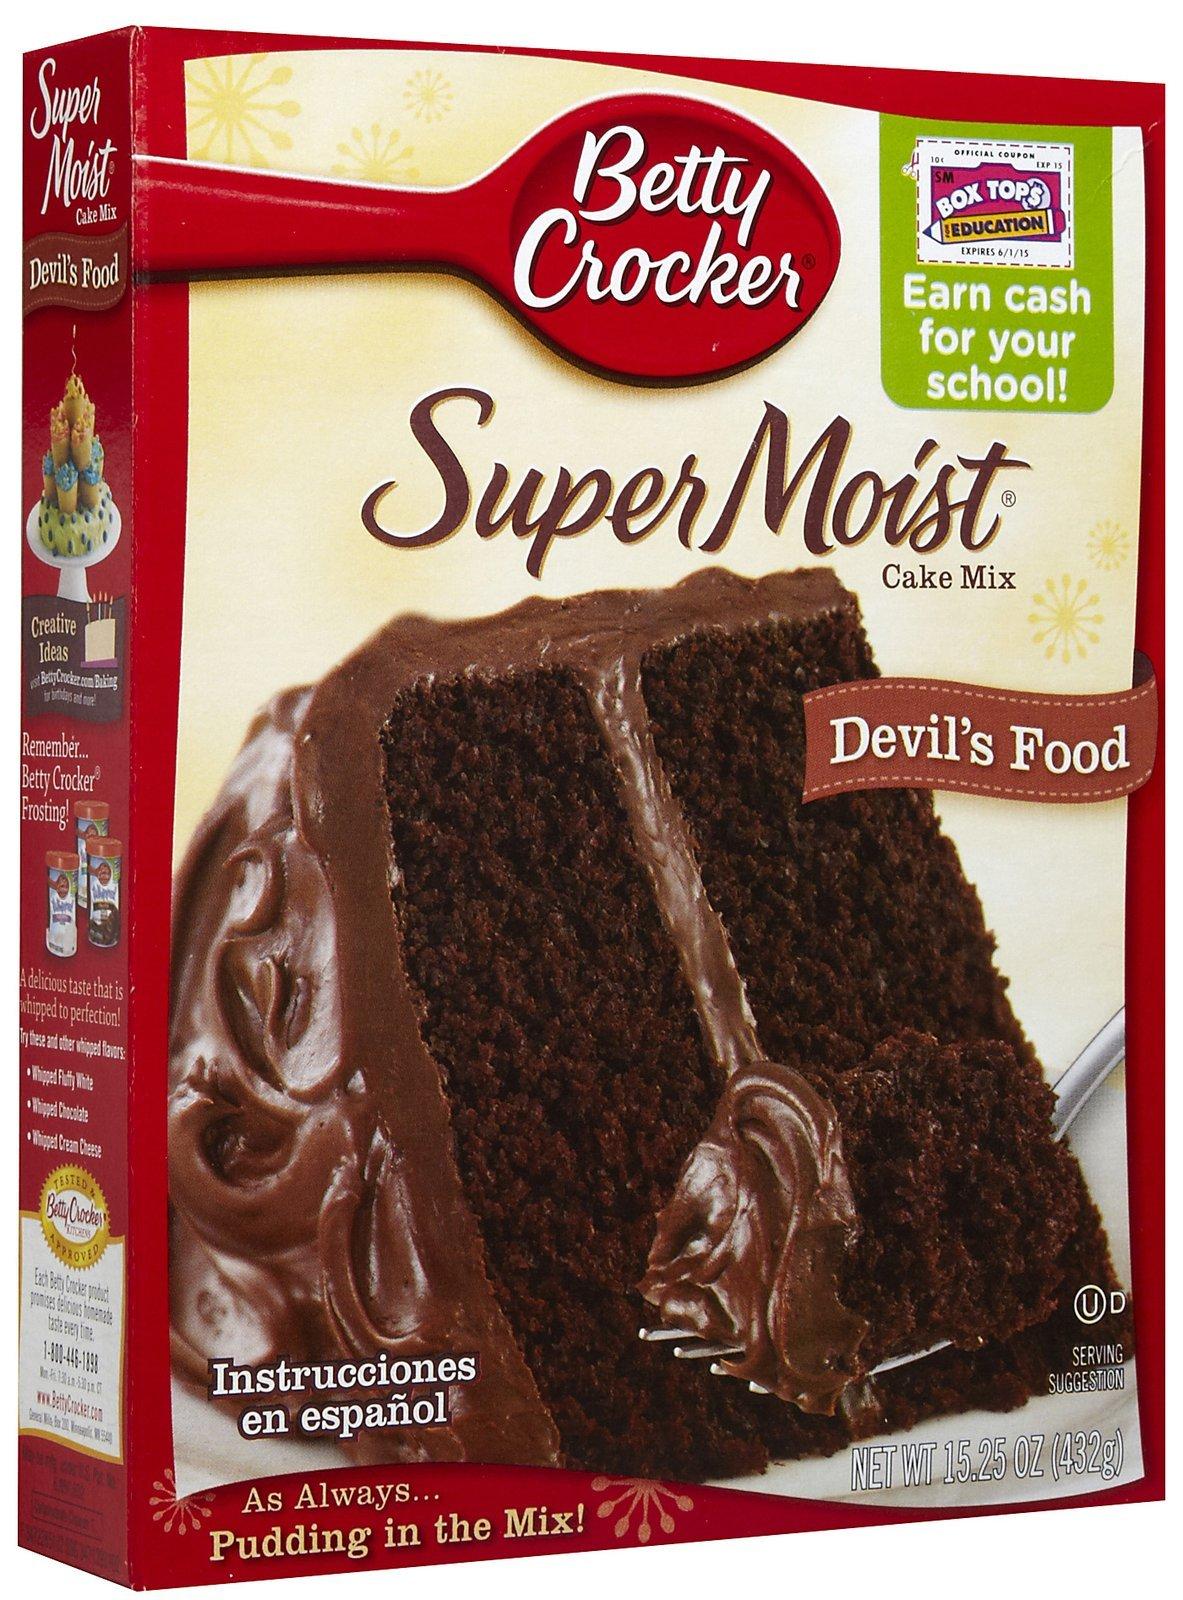 Betty Crocker Super Moist Cake Mix, Devil's Food, 15.25 oz Box